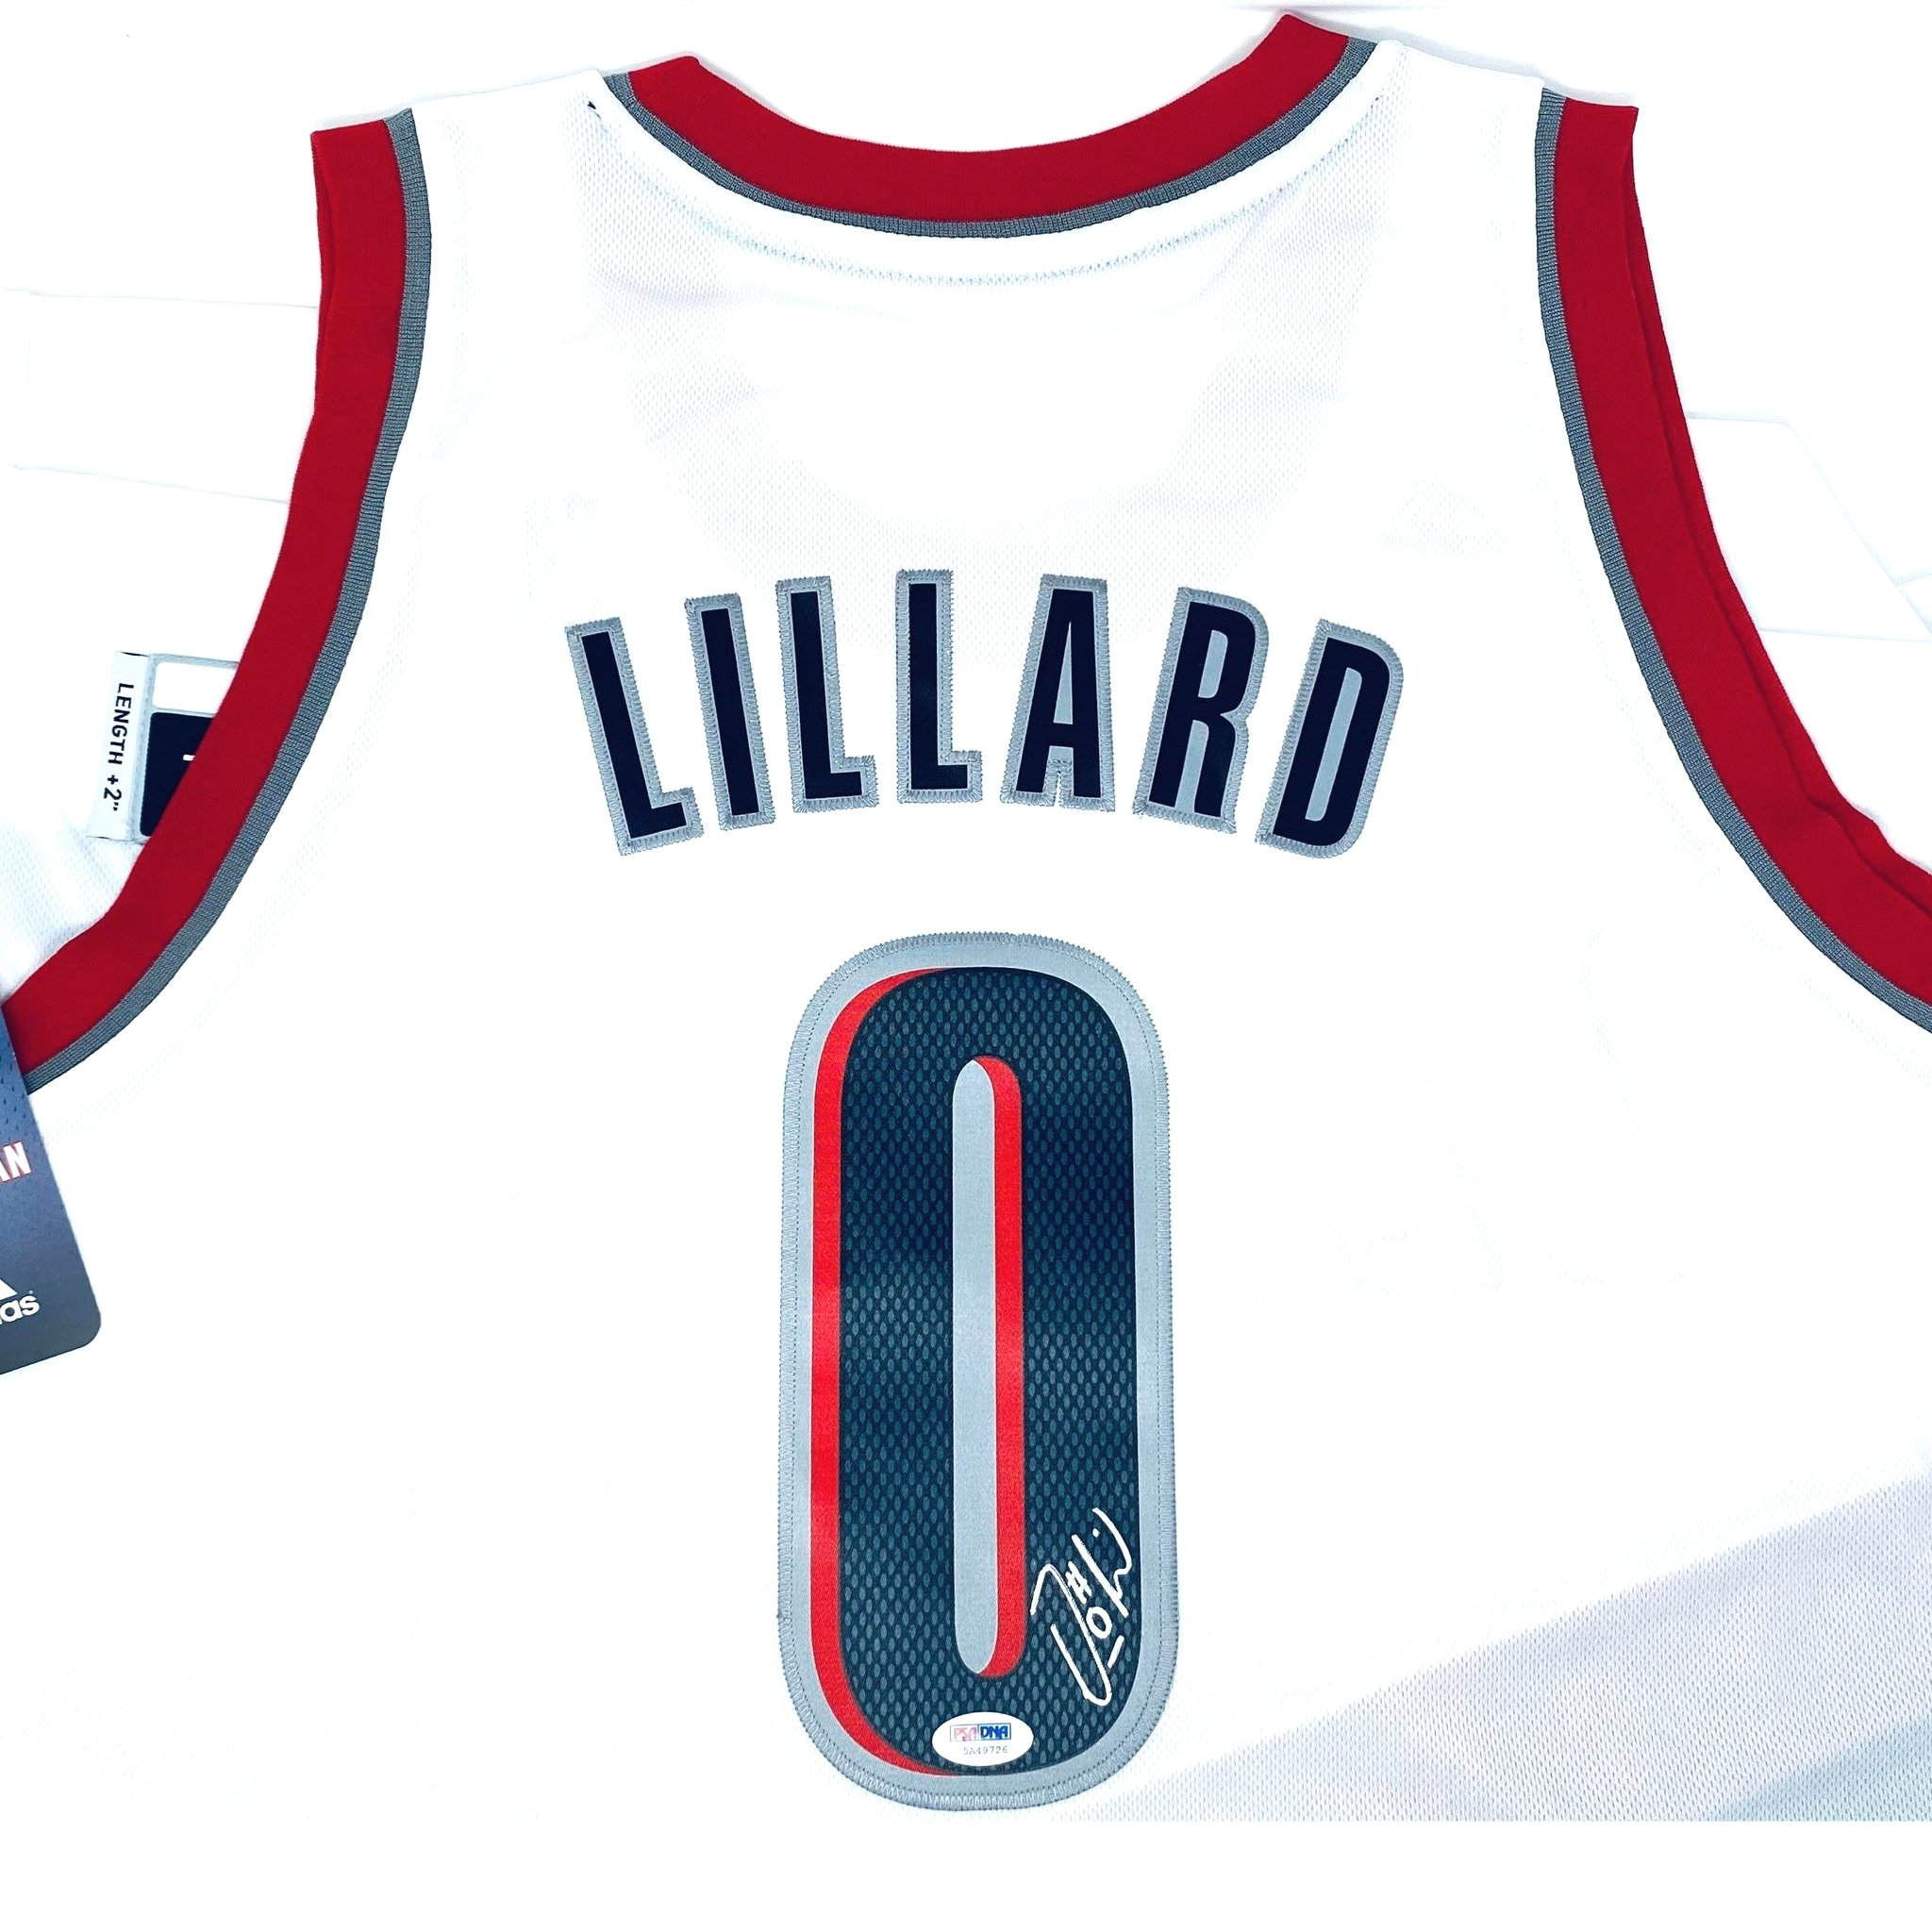 Damian Lillard Autographed Jersey Portland Trail Blazers